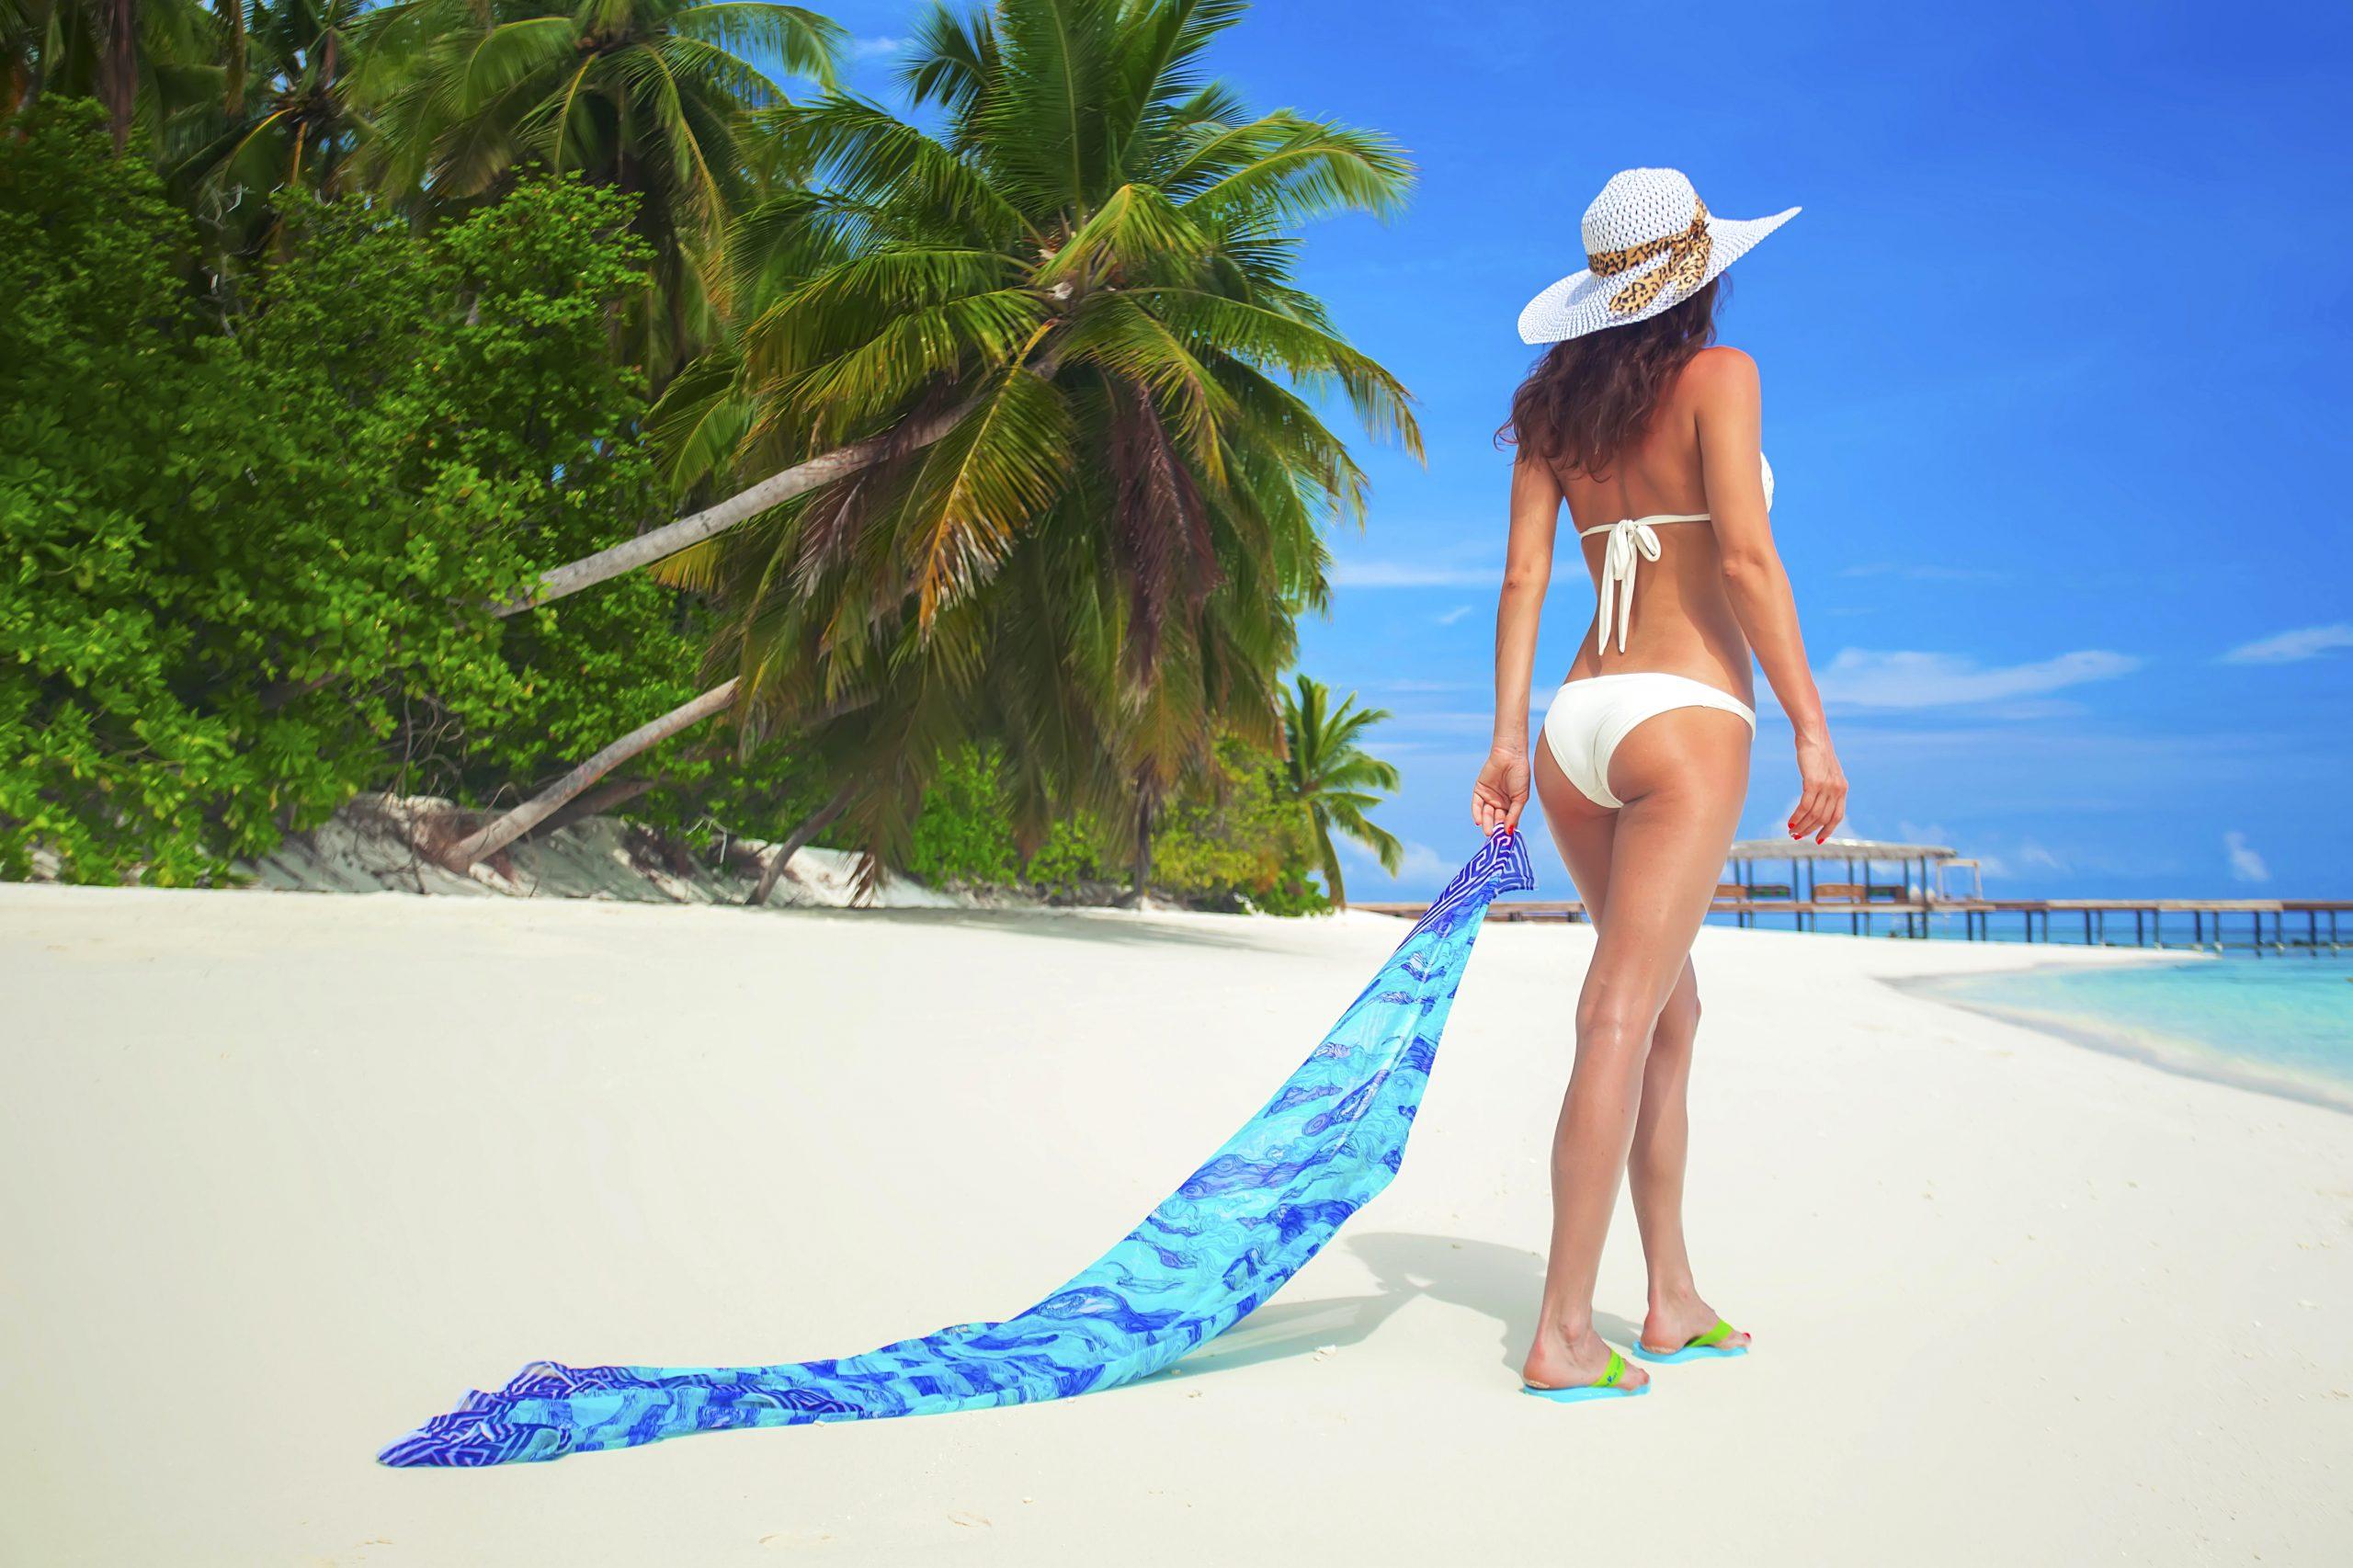 maldives 艾菲伊自然度假岛 AaaVeee Nature